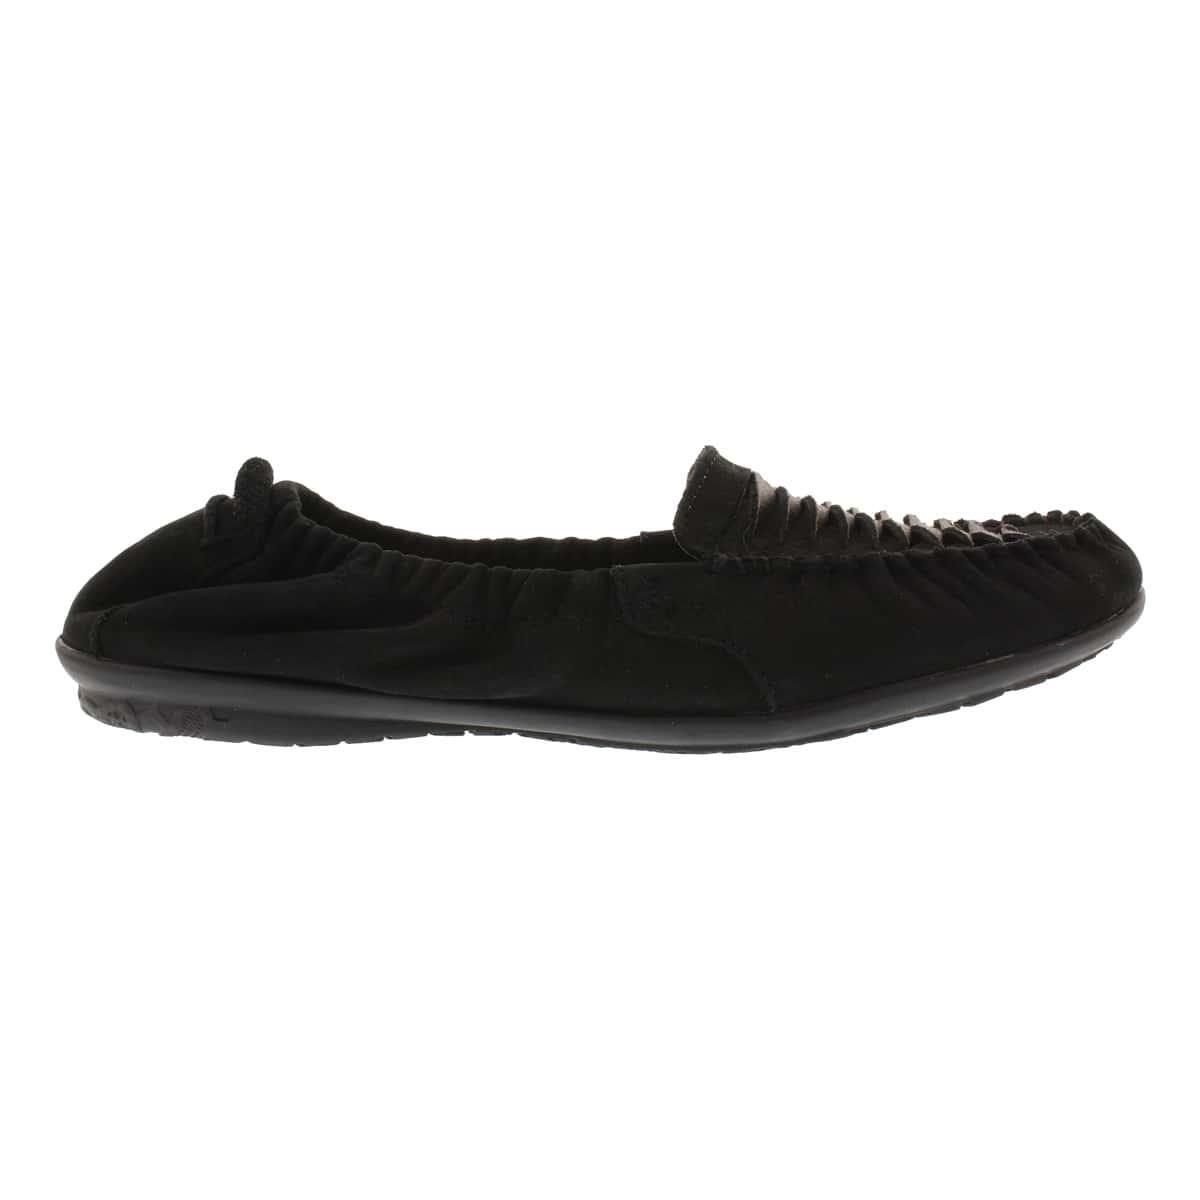 Lds Lydia Ceil black slip on loafer